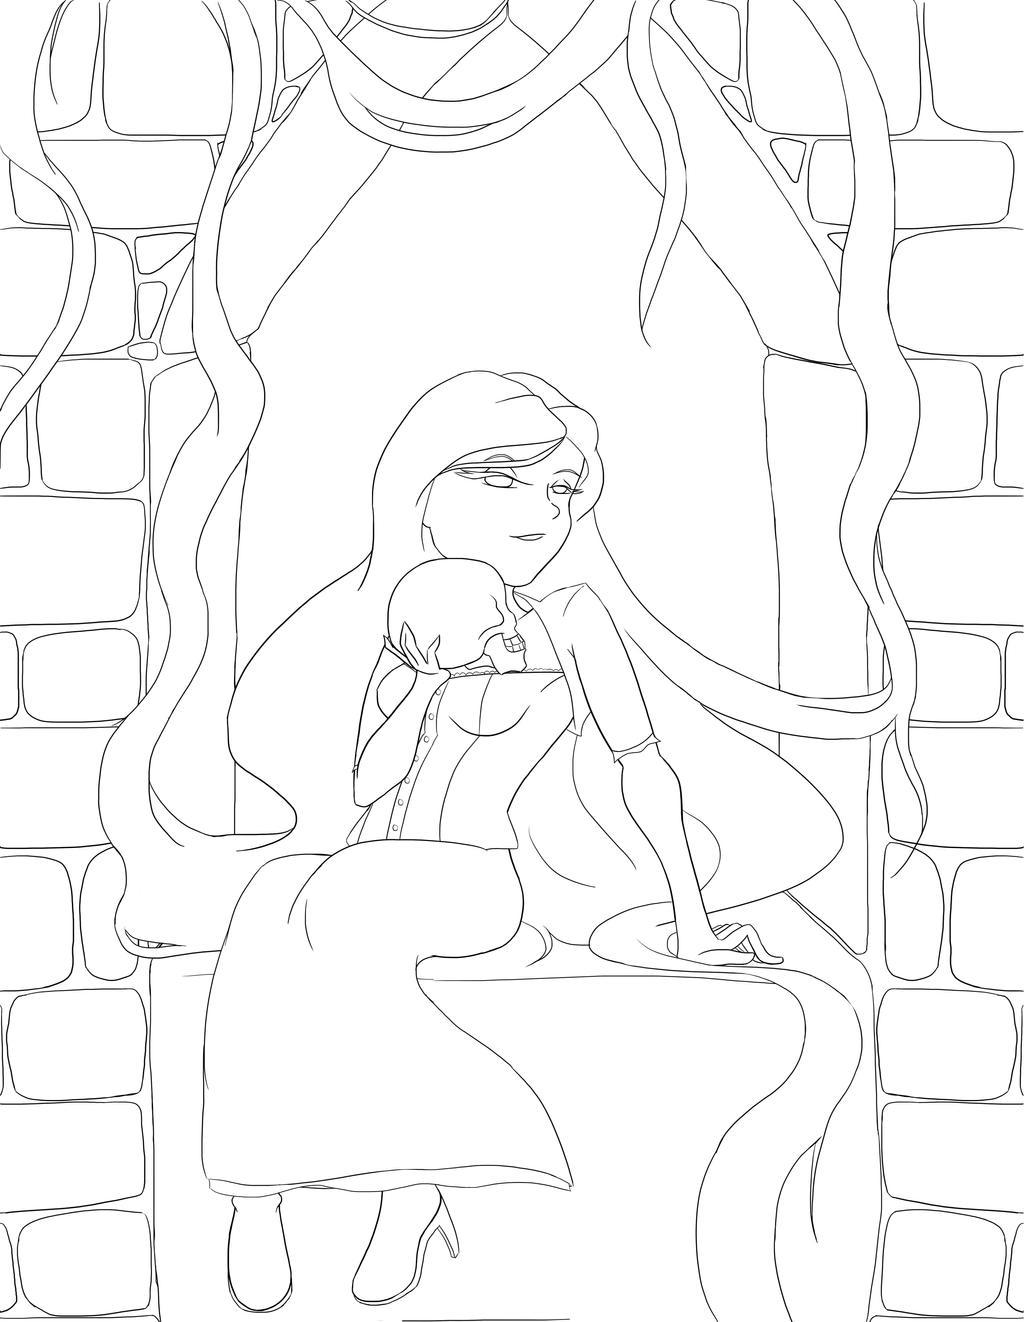 Rapunzel Lineart : Rapunzel s twisted fairytale lineart by reisespieces on